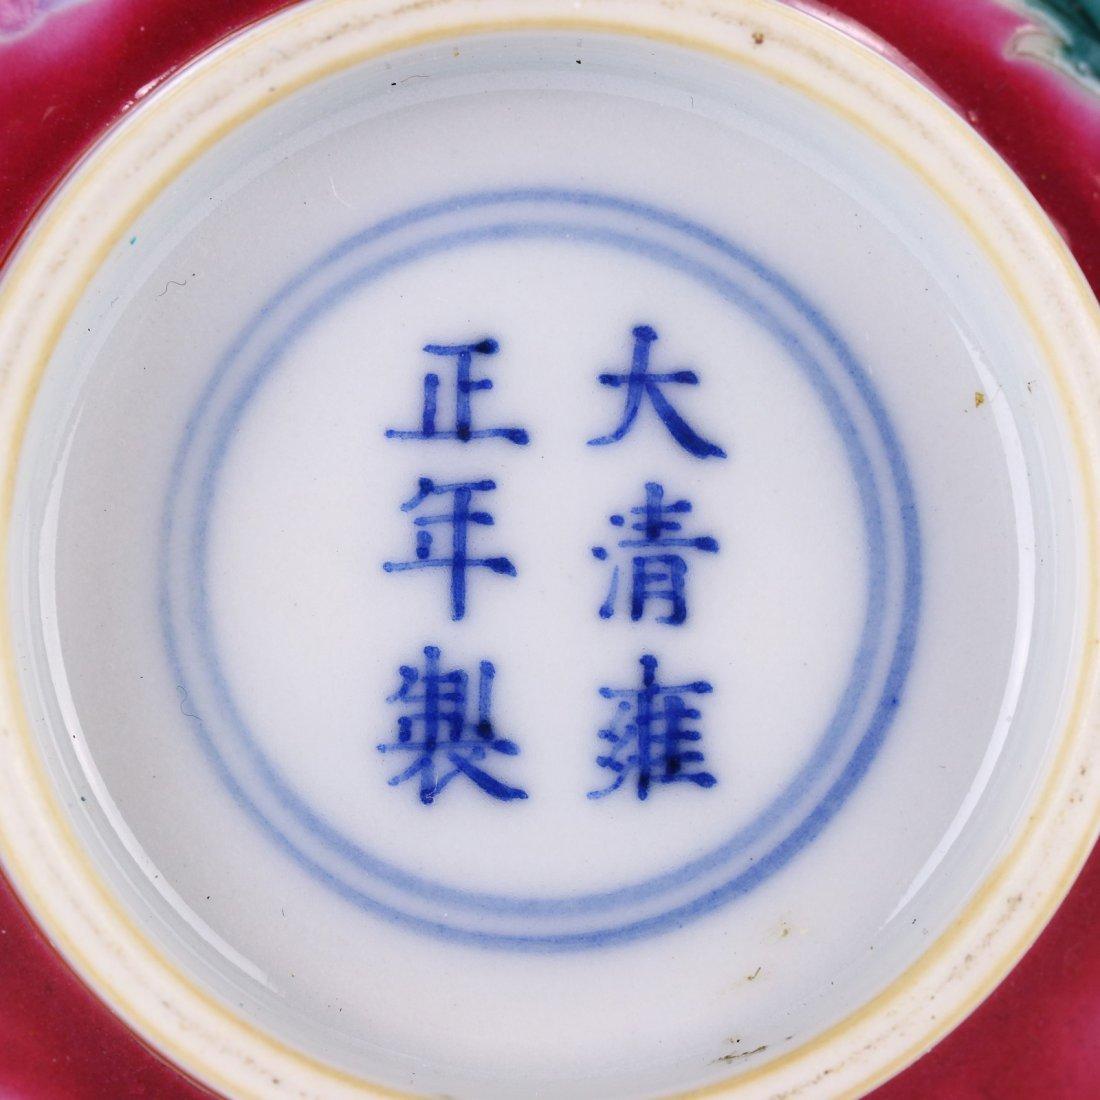 A Chinese Antique Famille Rose Porcelain Vase - 5